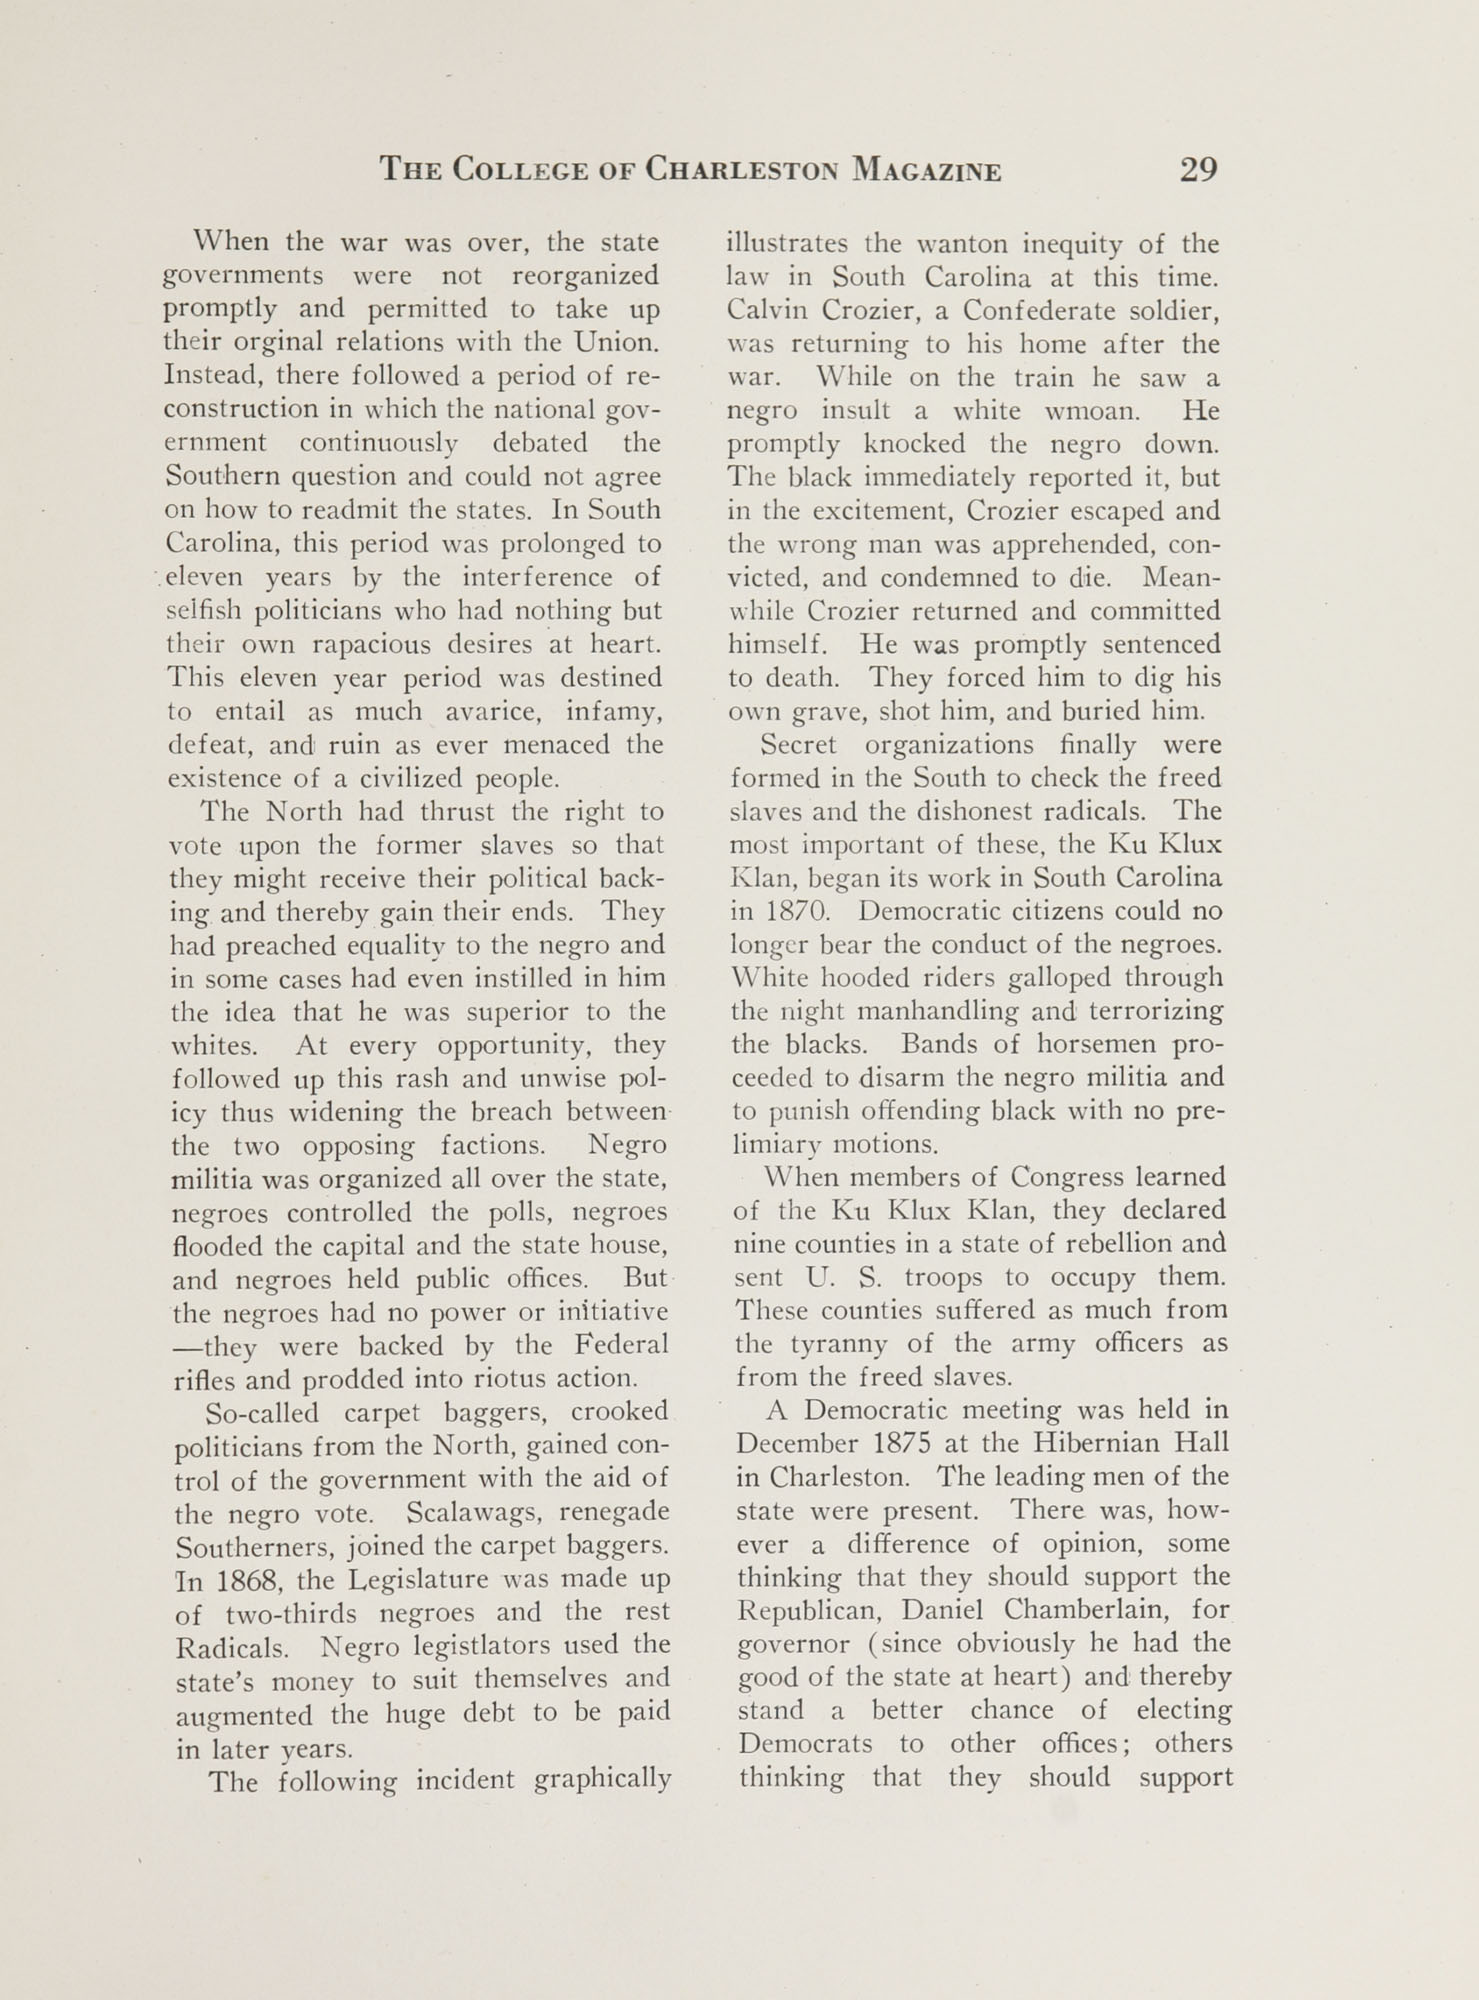 College of Charleston Magazine, 1937-1938, Vol. XXXXI No. 1, page 29